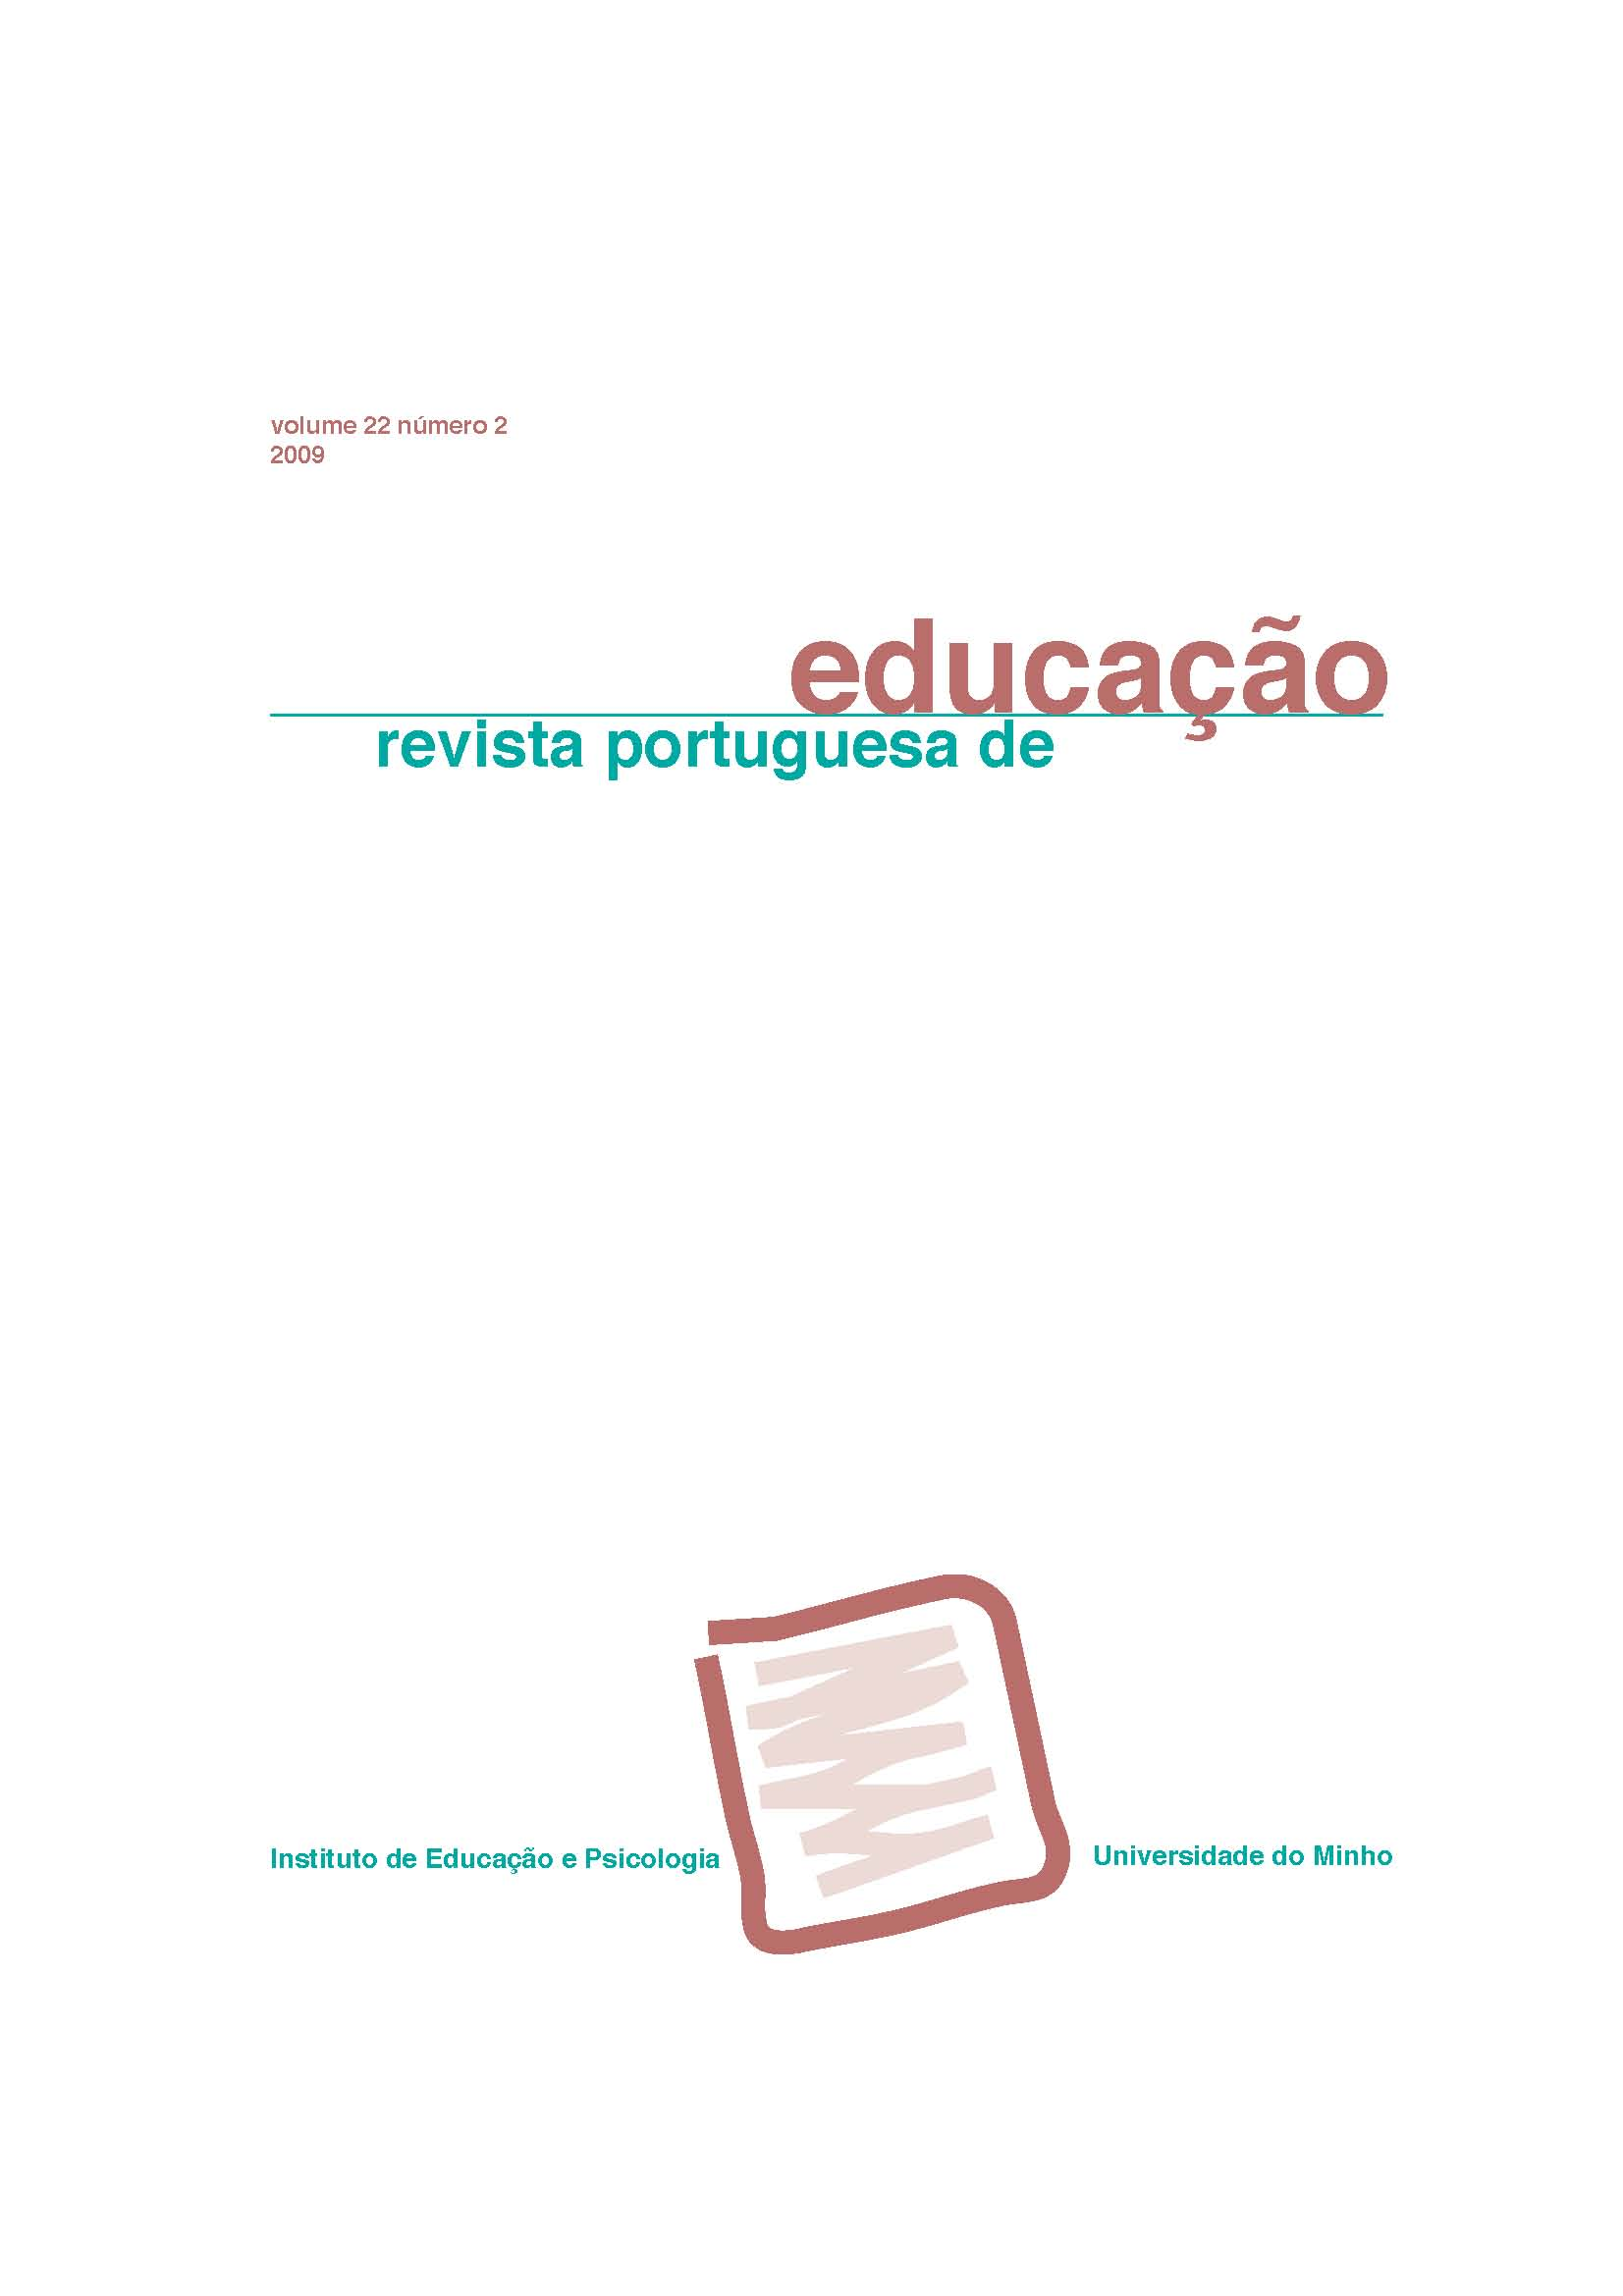 Ver Vol. 22 N.º 2 (2009)